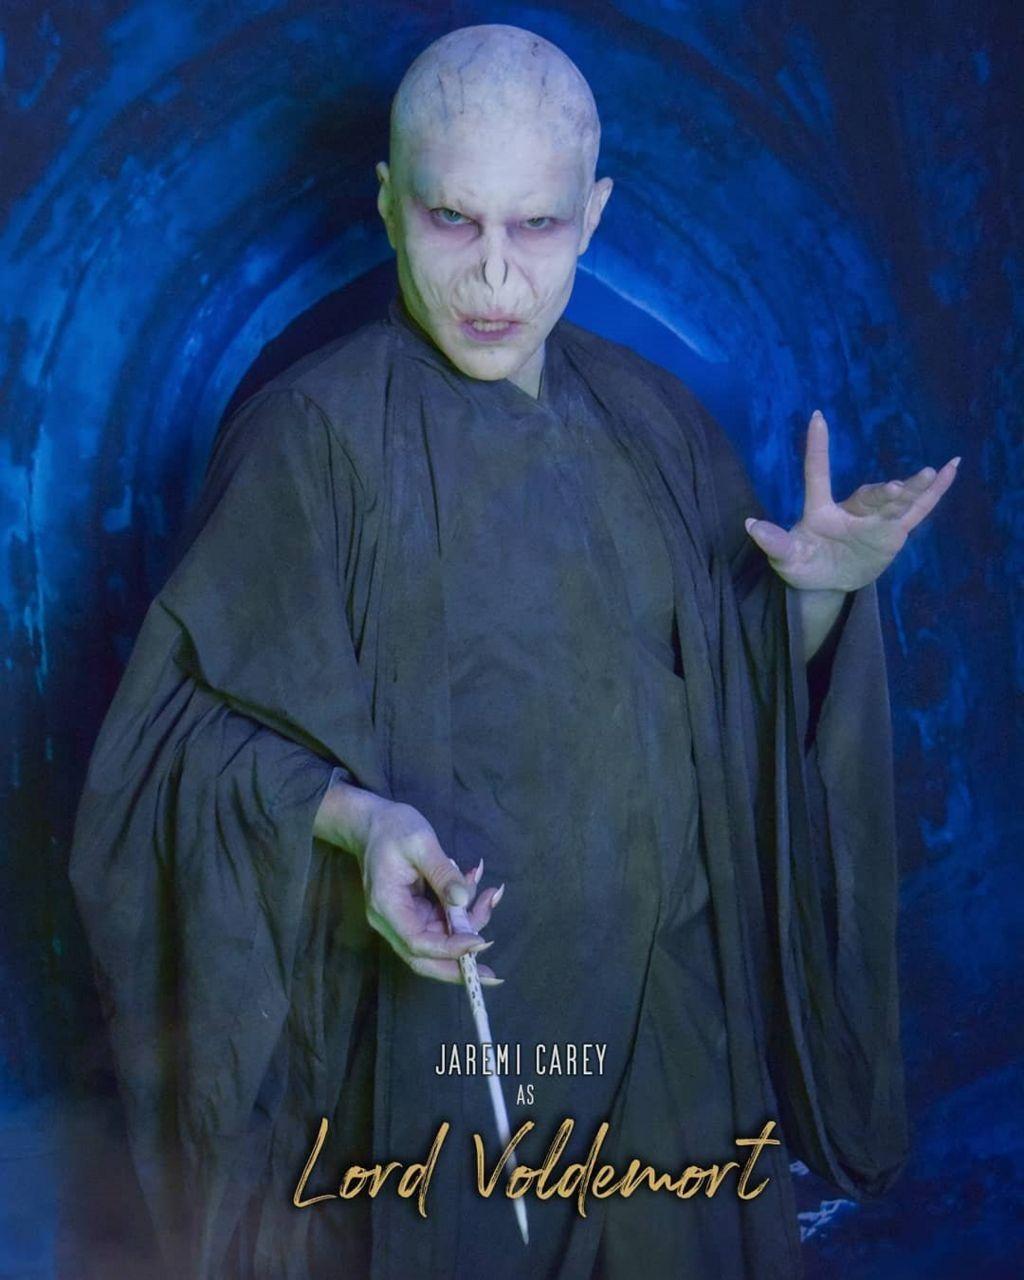 Jaremi Carey as Lord Voldemort